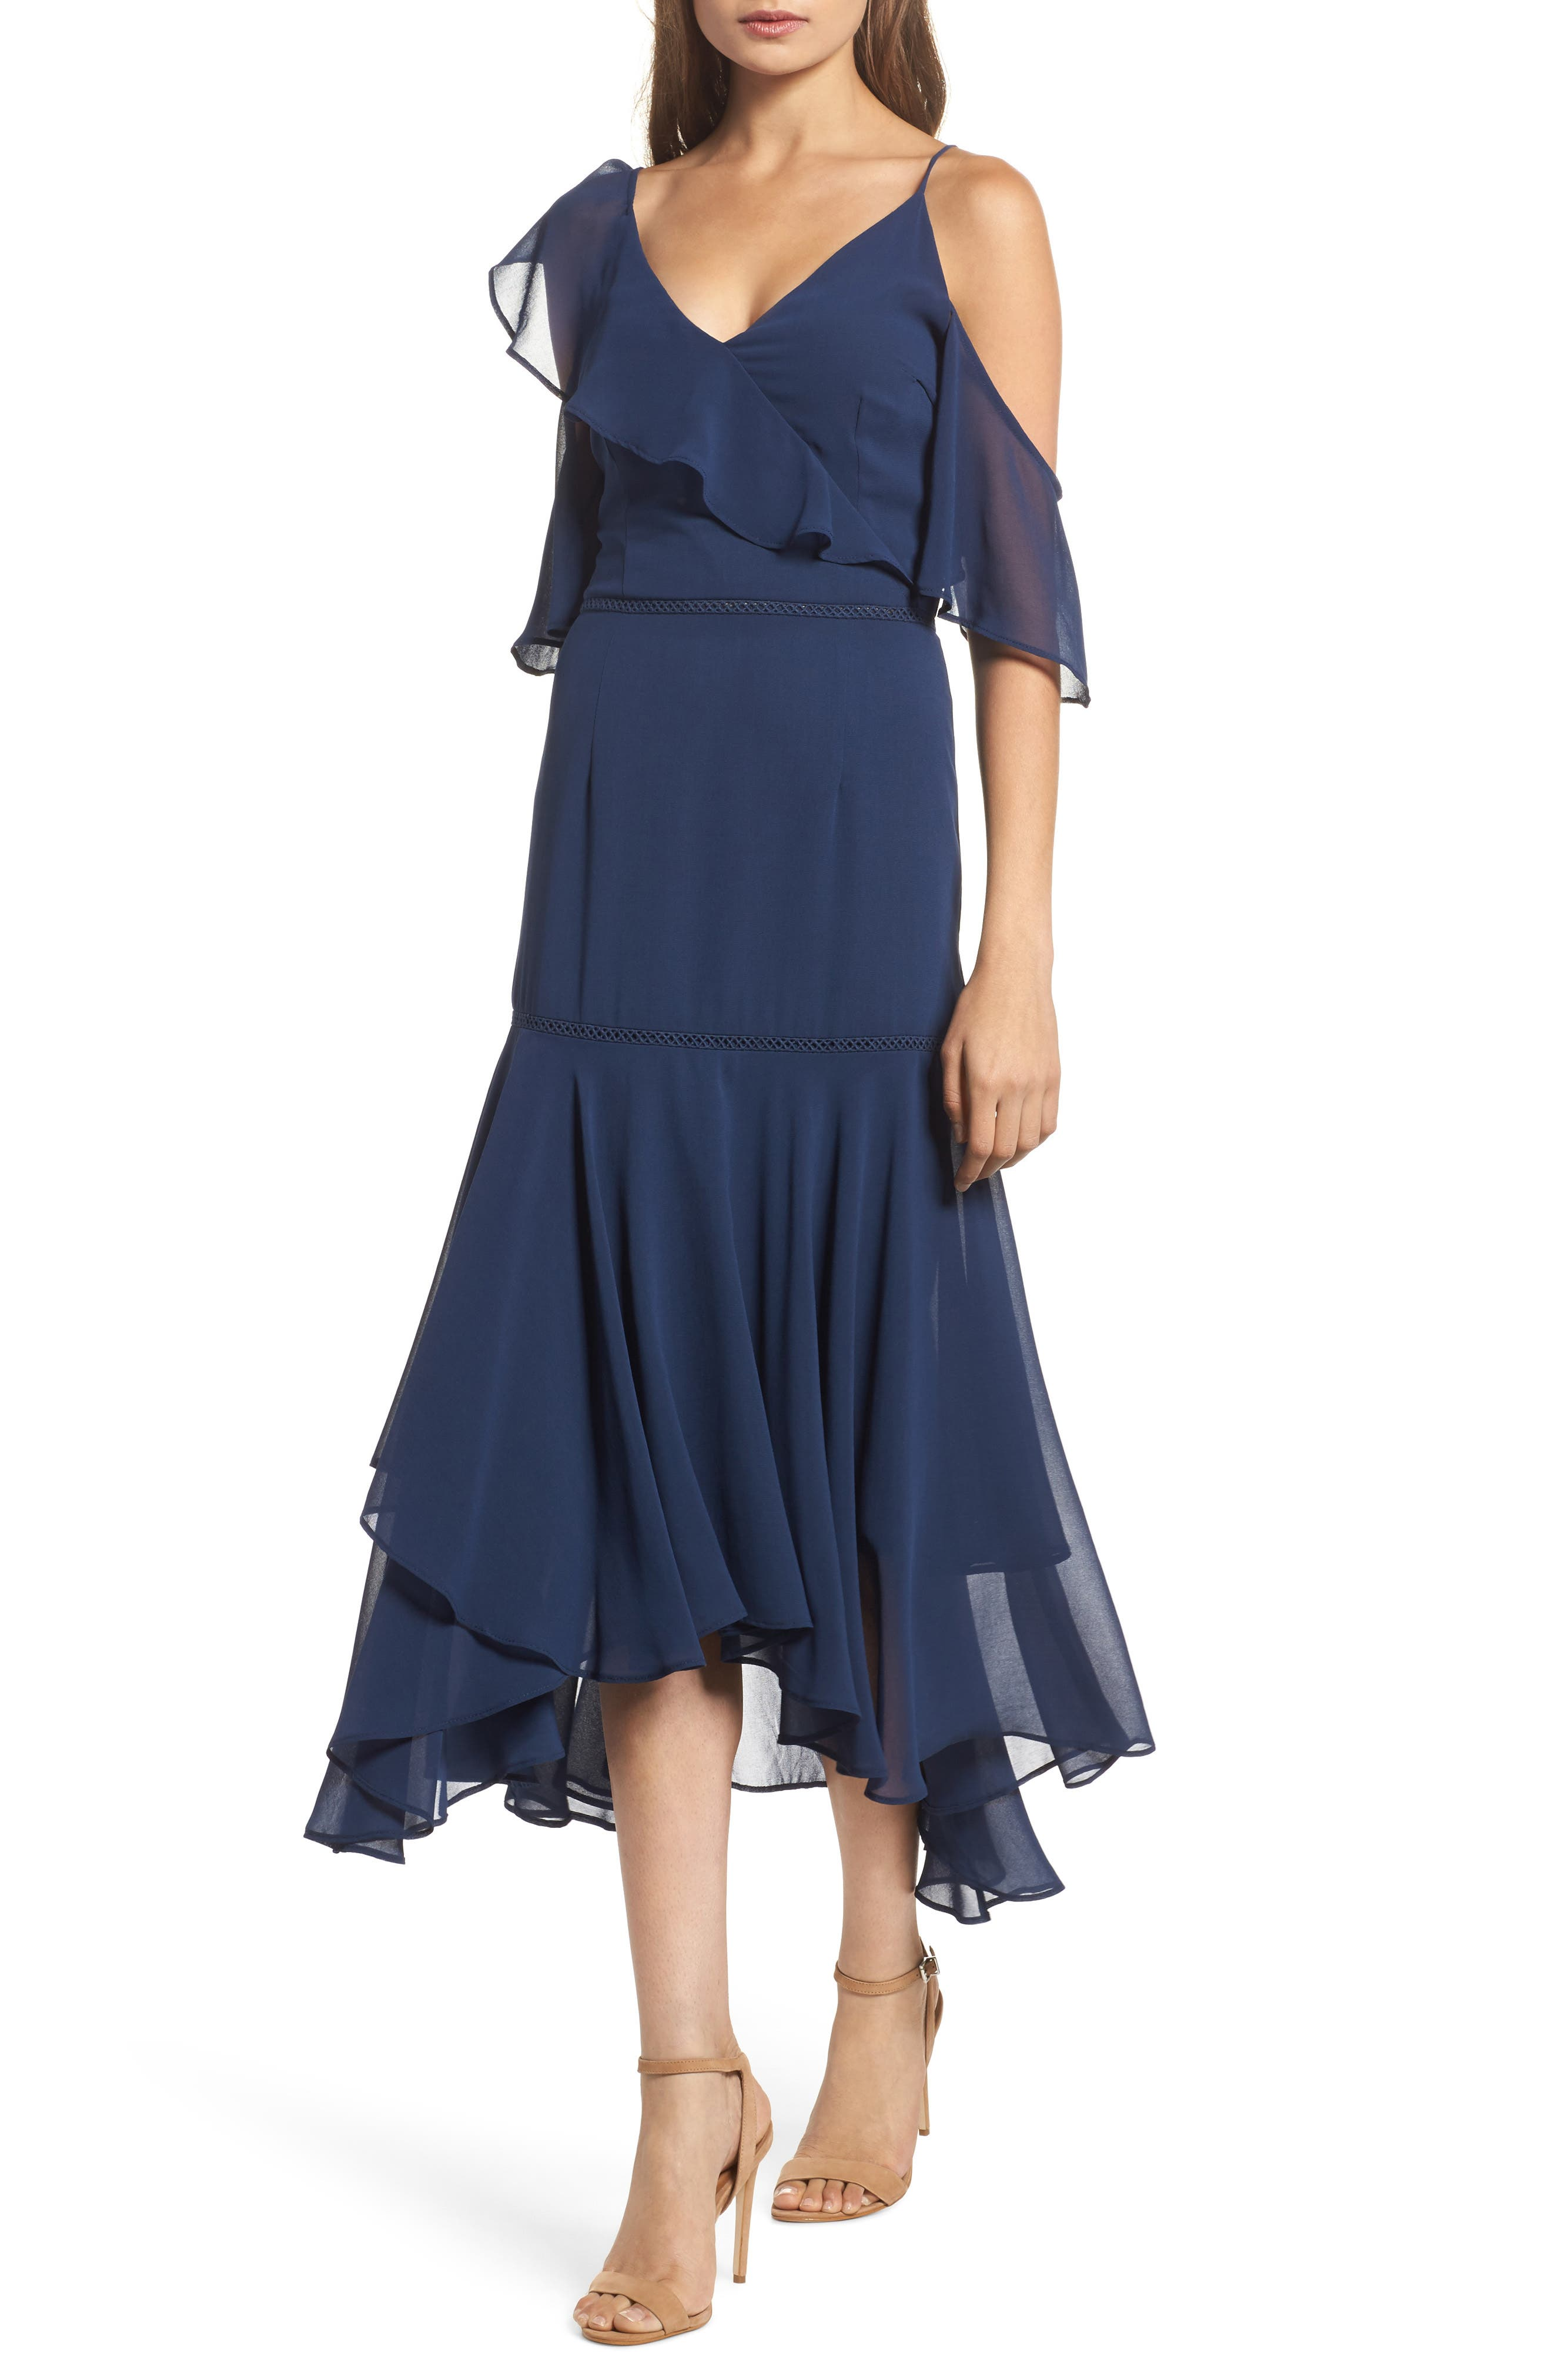 Utopia Cold Shoulder Midi Dress,                             Main thumbnail 1, color,                             435